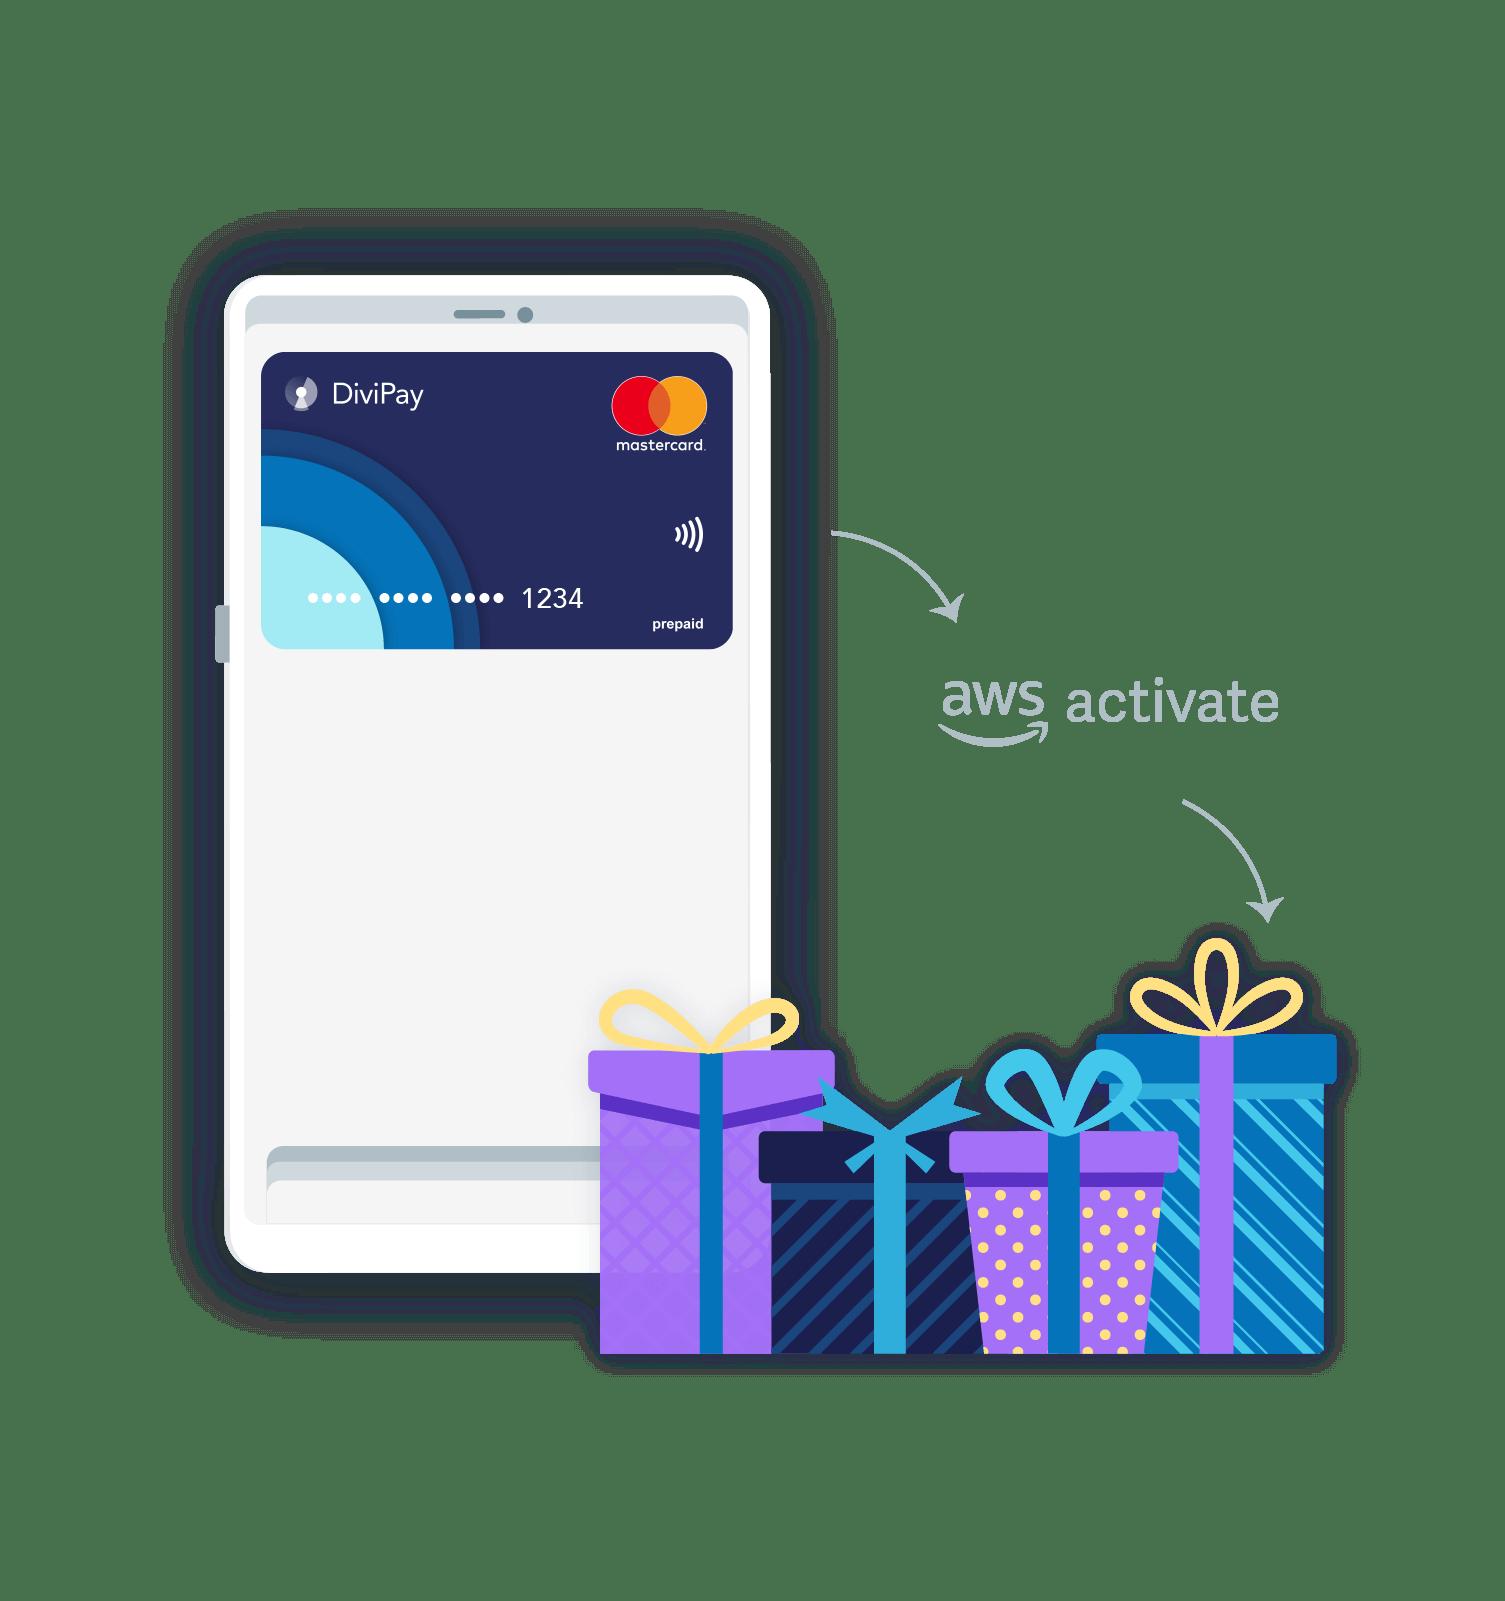 AWS activate discounts